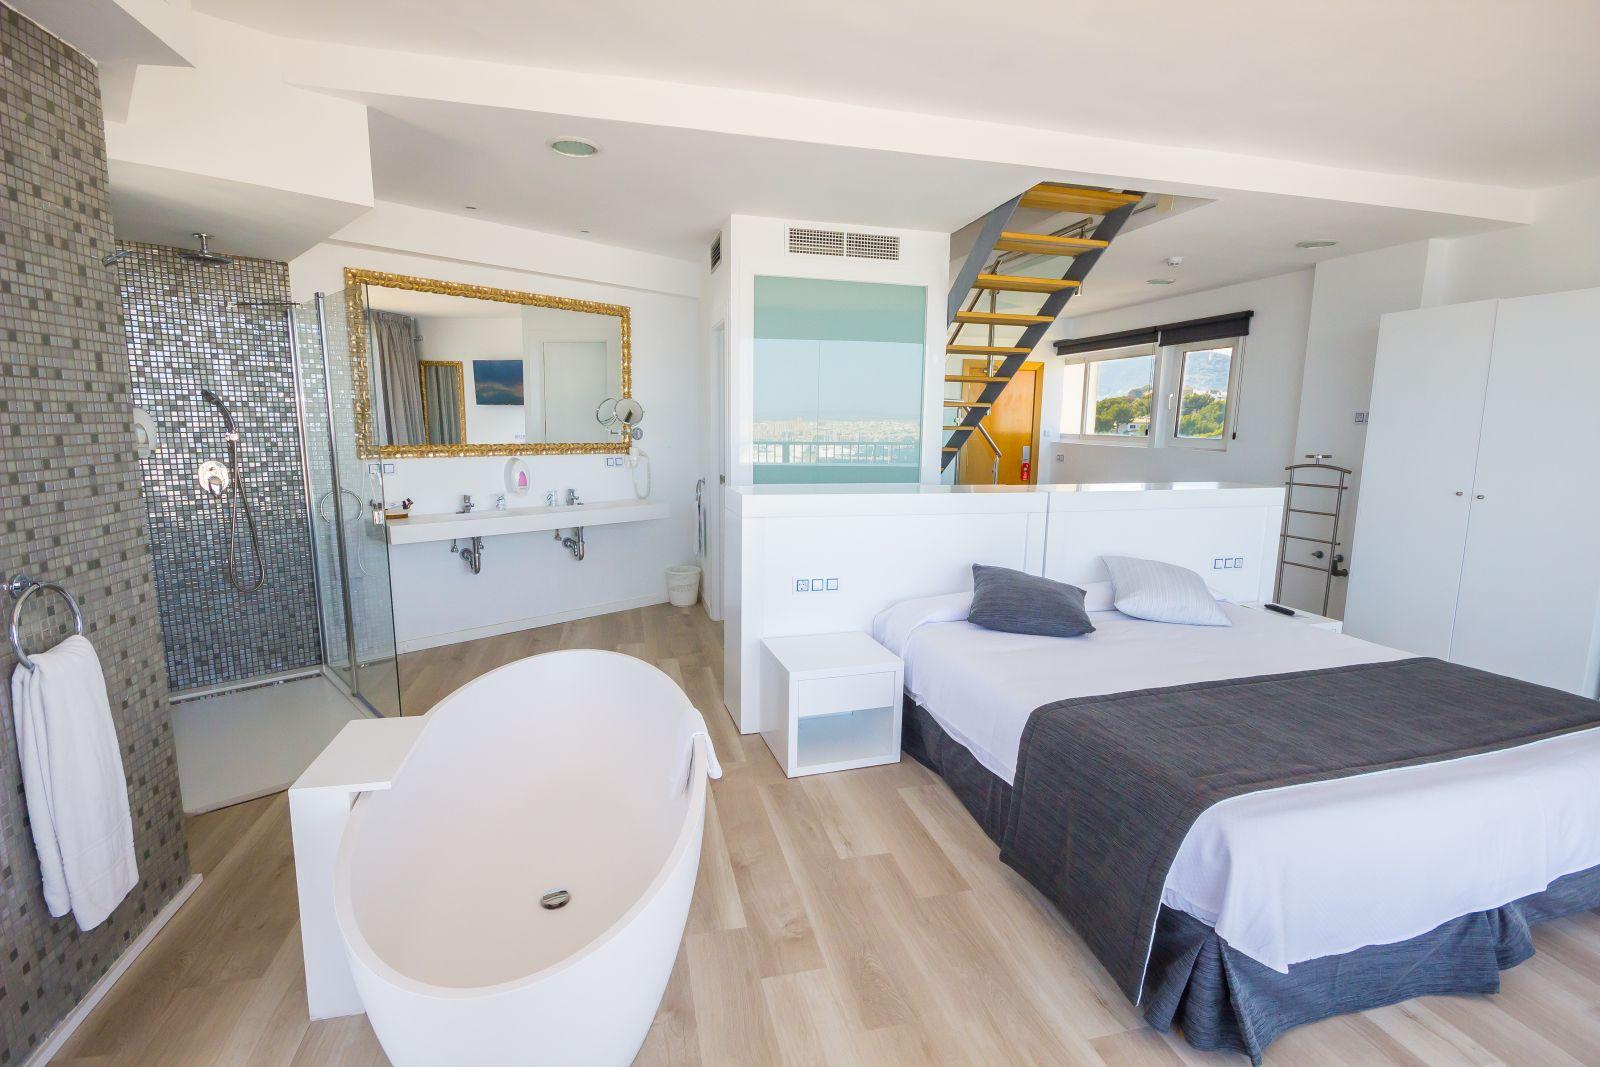 Hotel amic horizonte suites de luxe for Cuartos de bano con banera